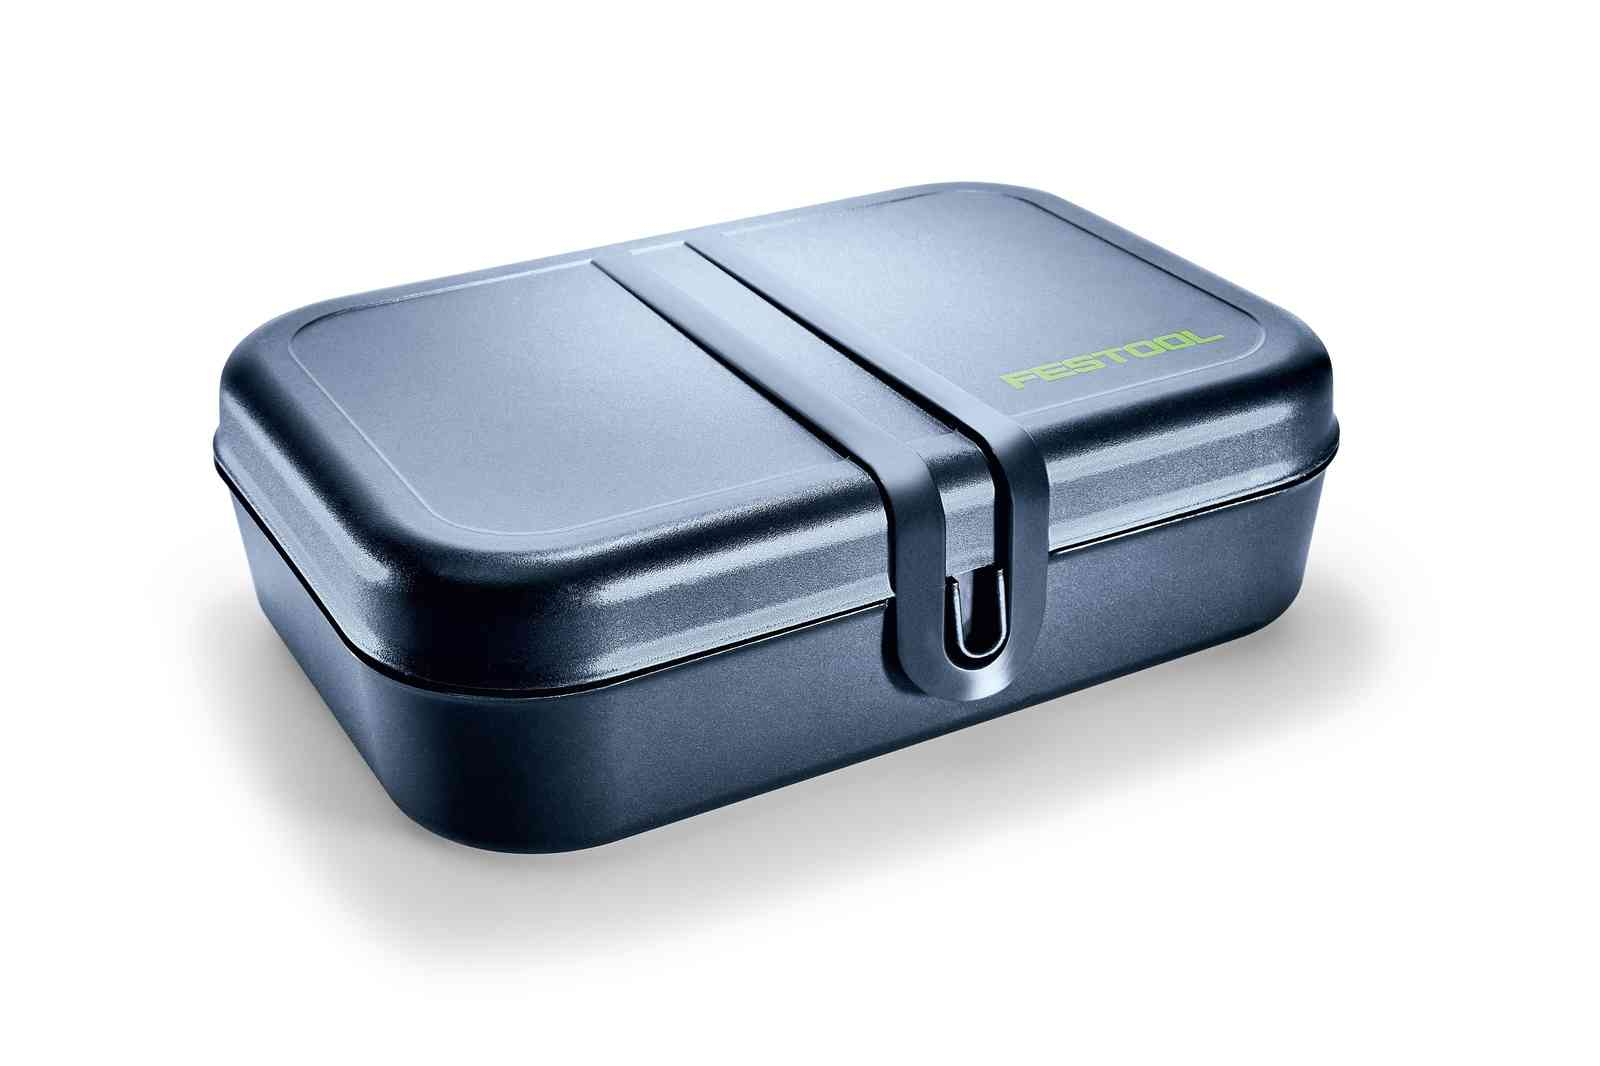 FESTOOL Lunchbox BOX-LCH FT1 L